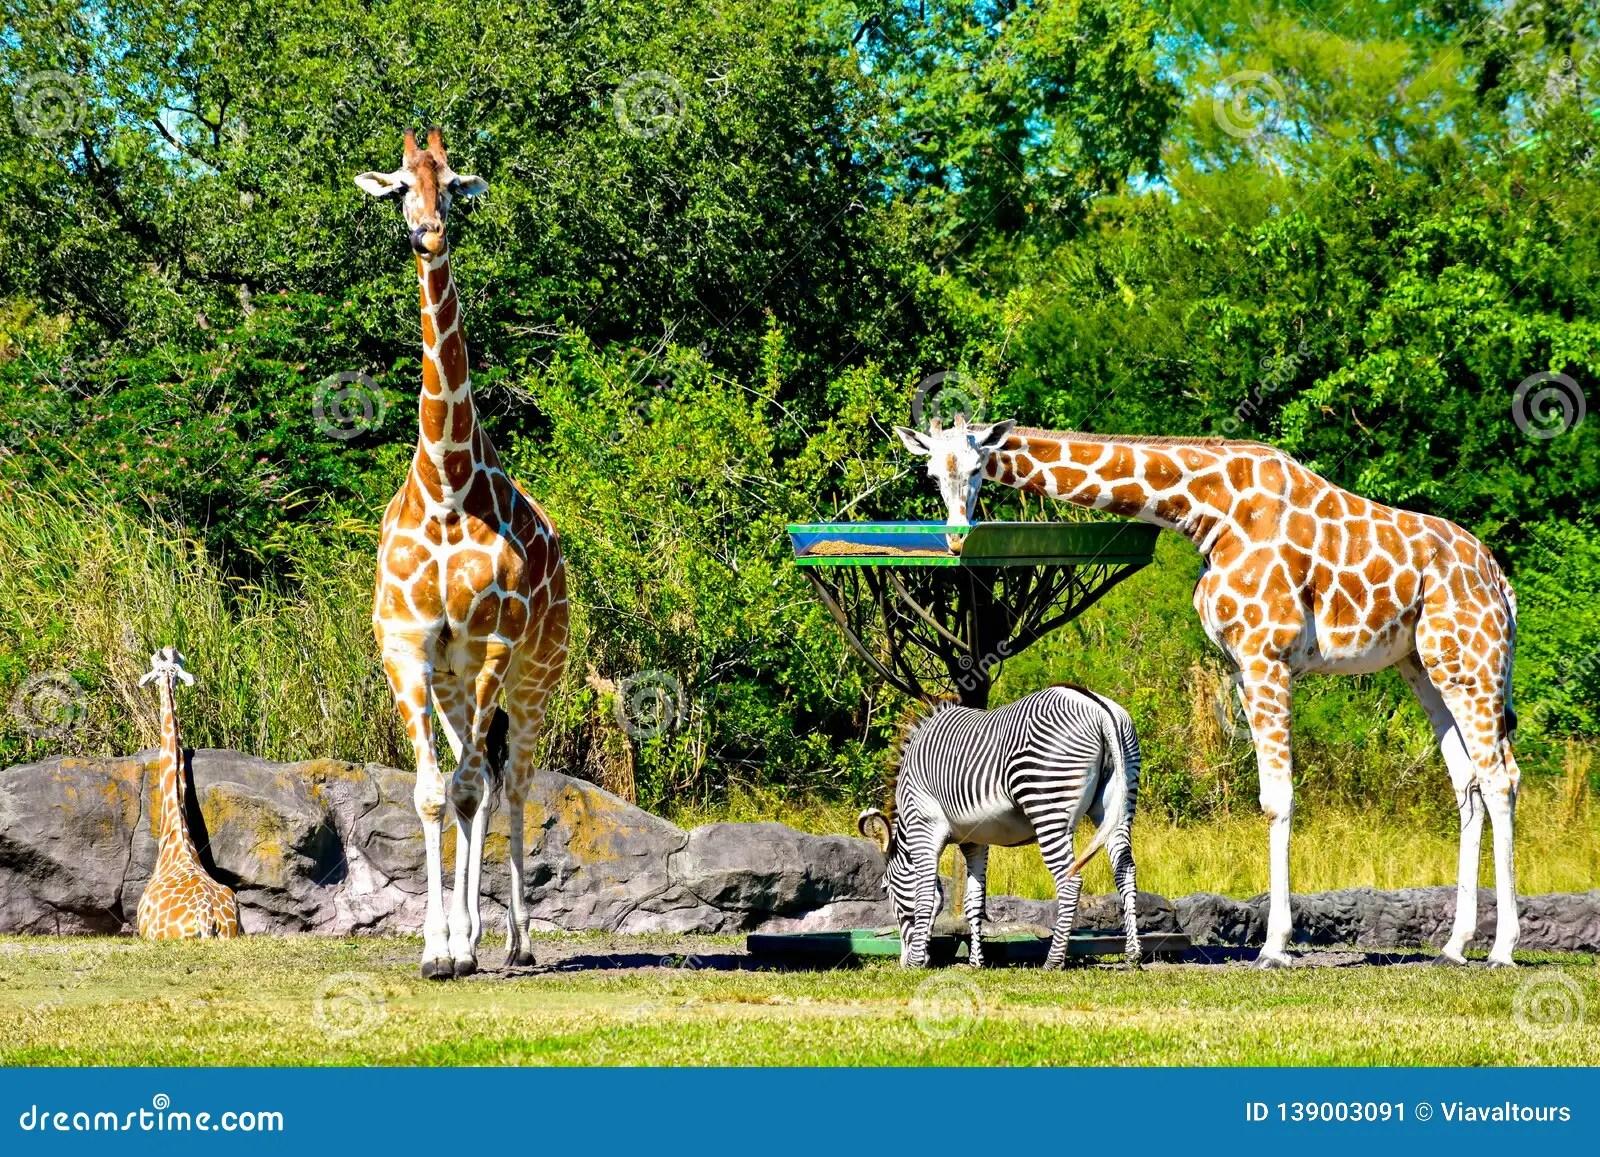 Giraffes And Zebra Feeding While Antelope Walks At Bush